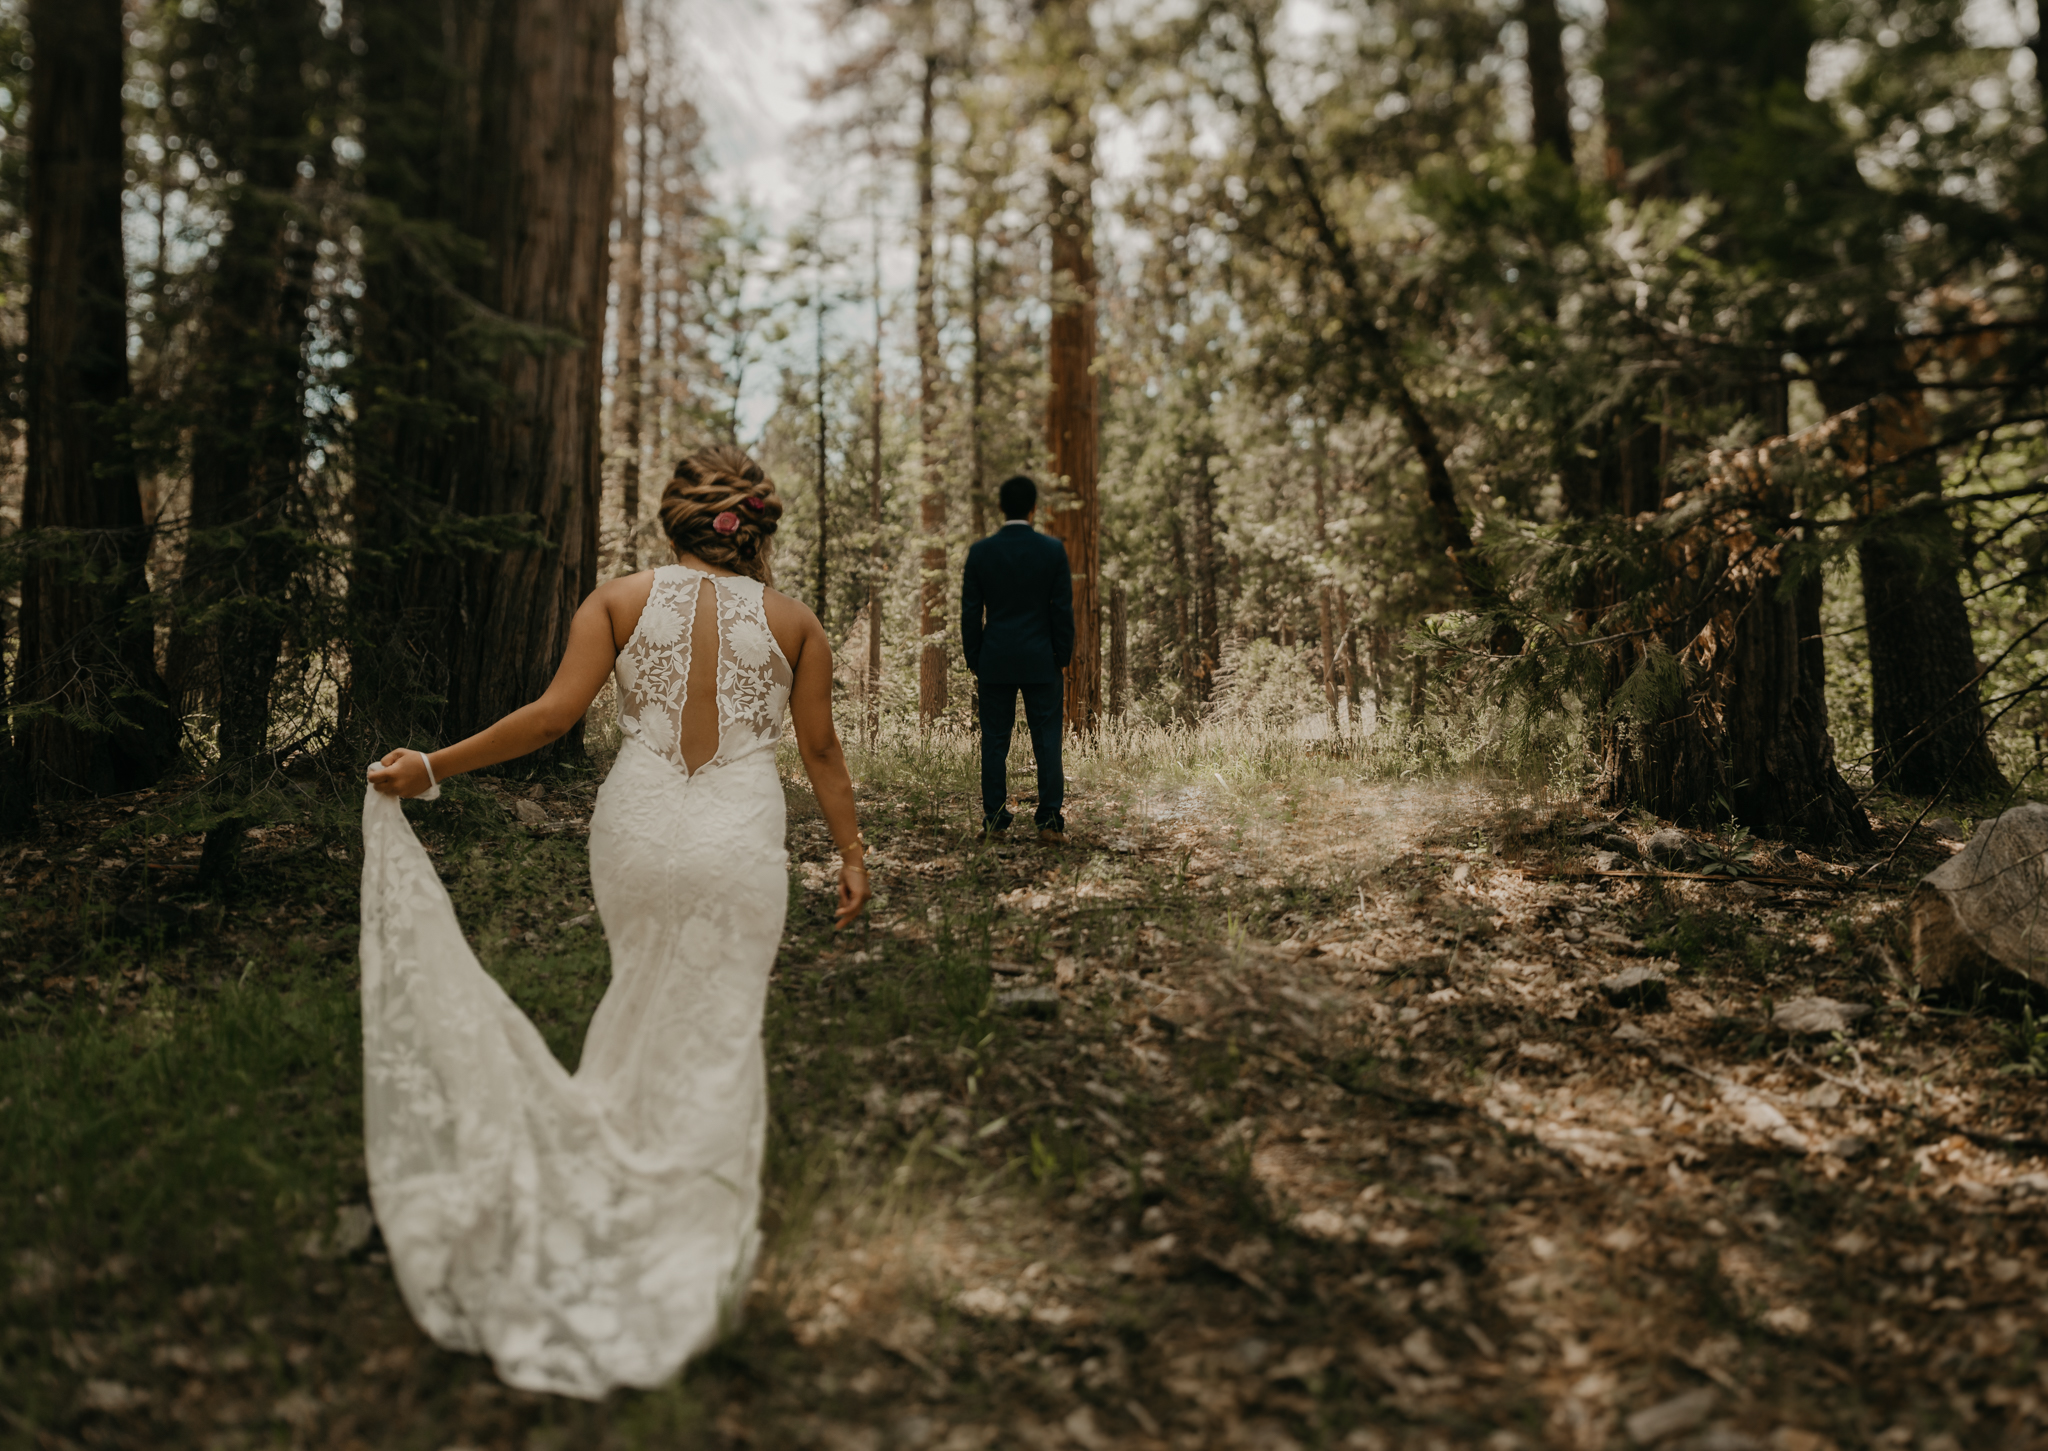 © Isaiah + Taylor Photography - Evergreen Lodge Destination Yoesmite Wedding - Los Angeles Wedding Photographer-068.jpg